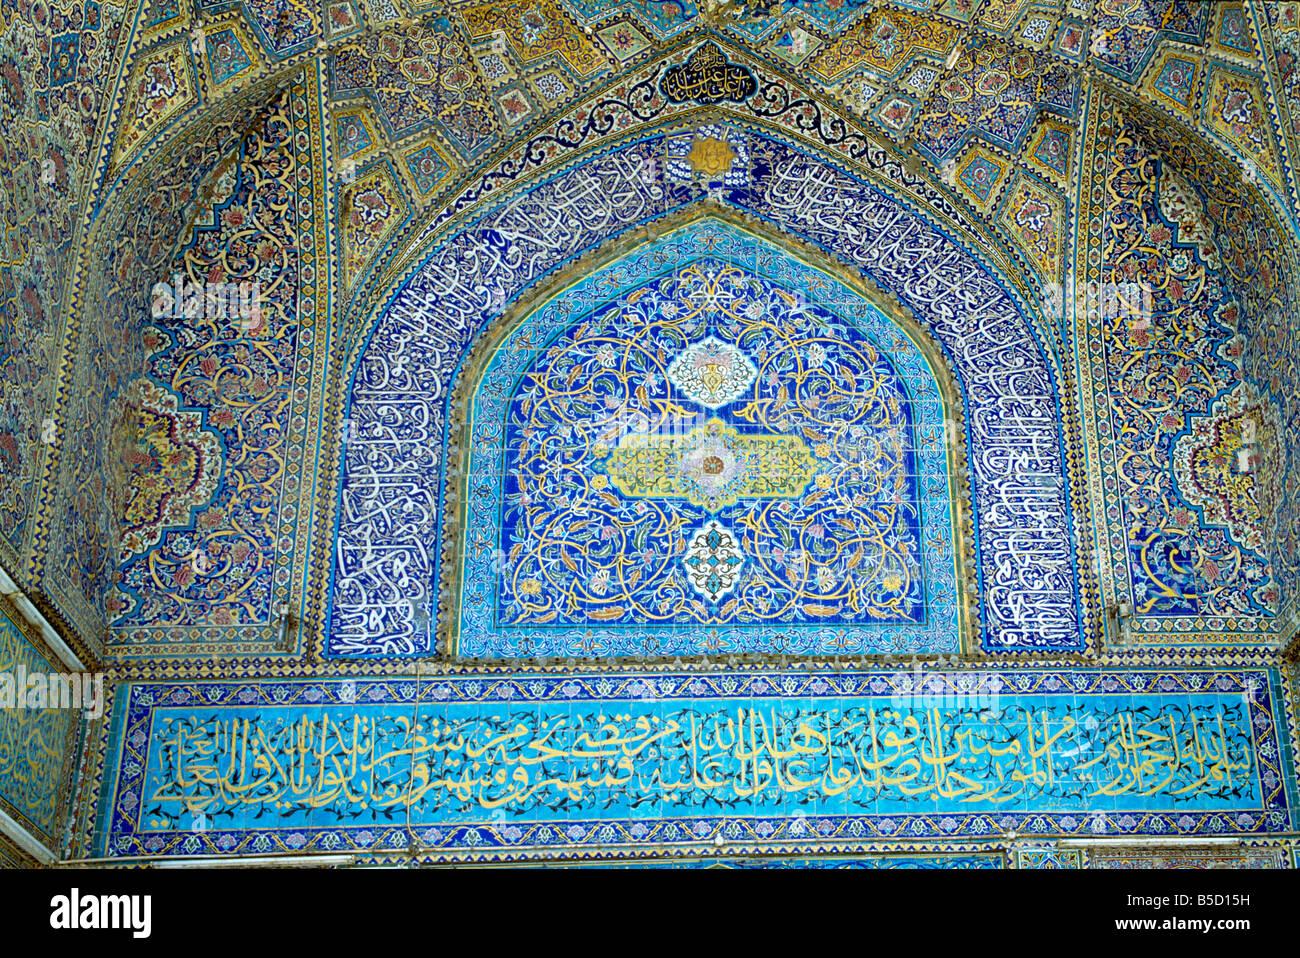 Imam Ali Stock Photos & Imam Ali Stock Images - Alamy